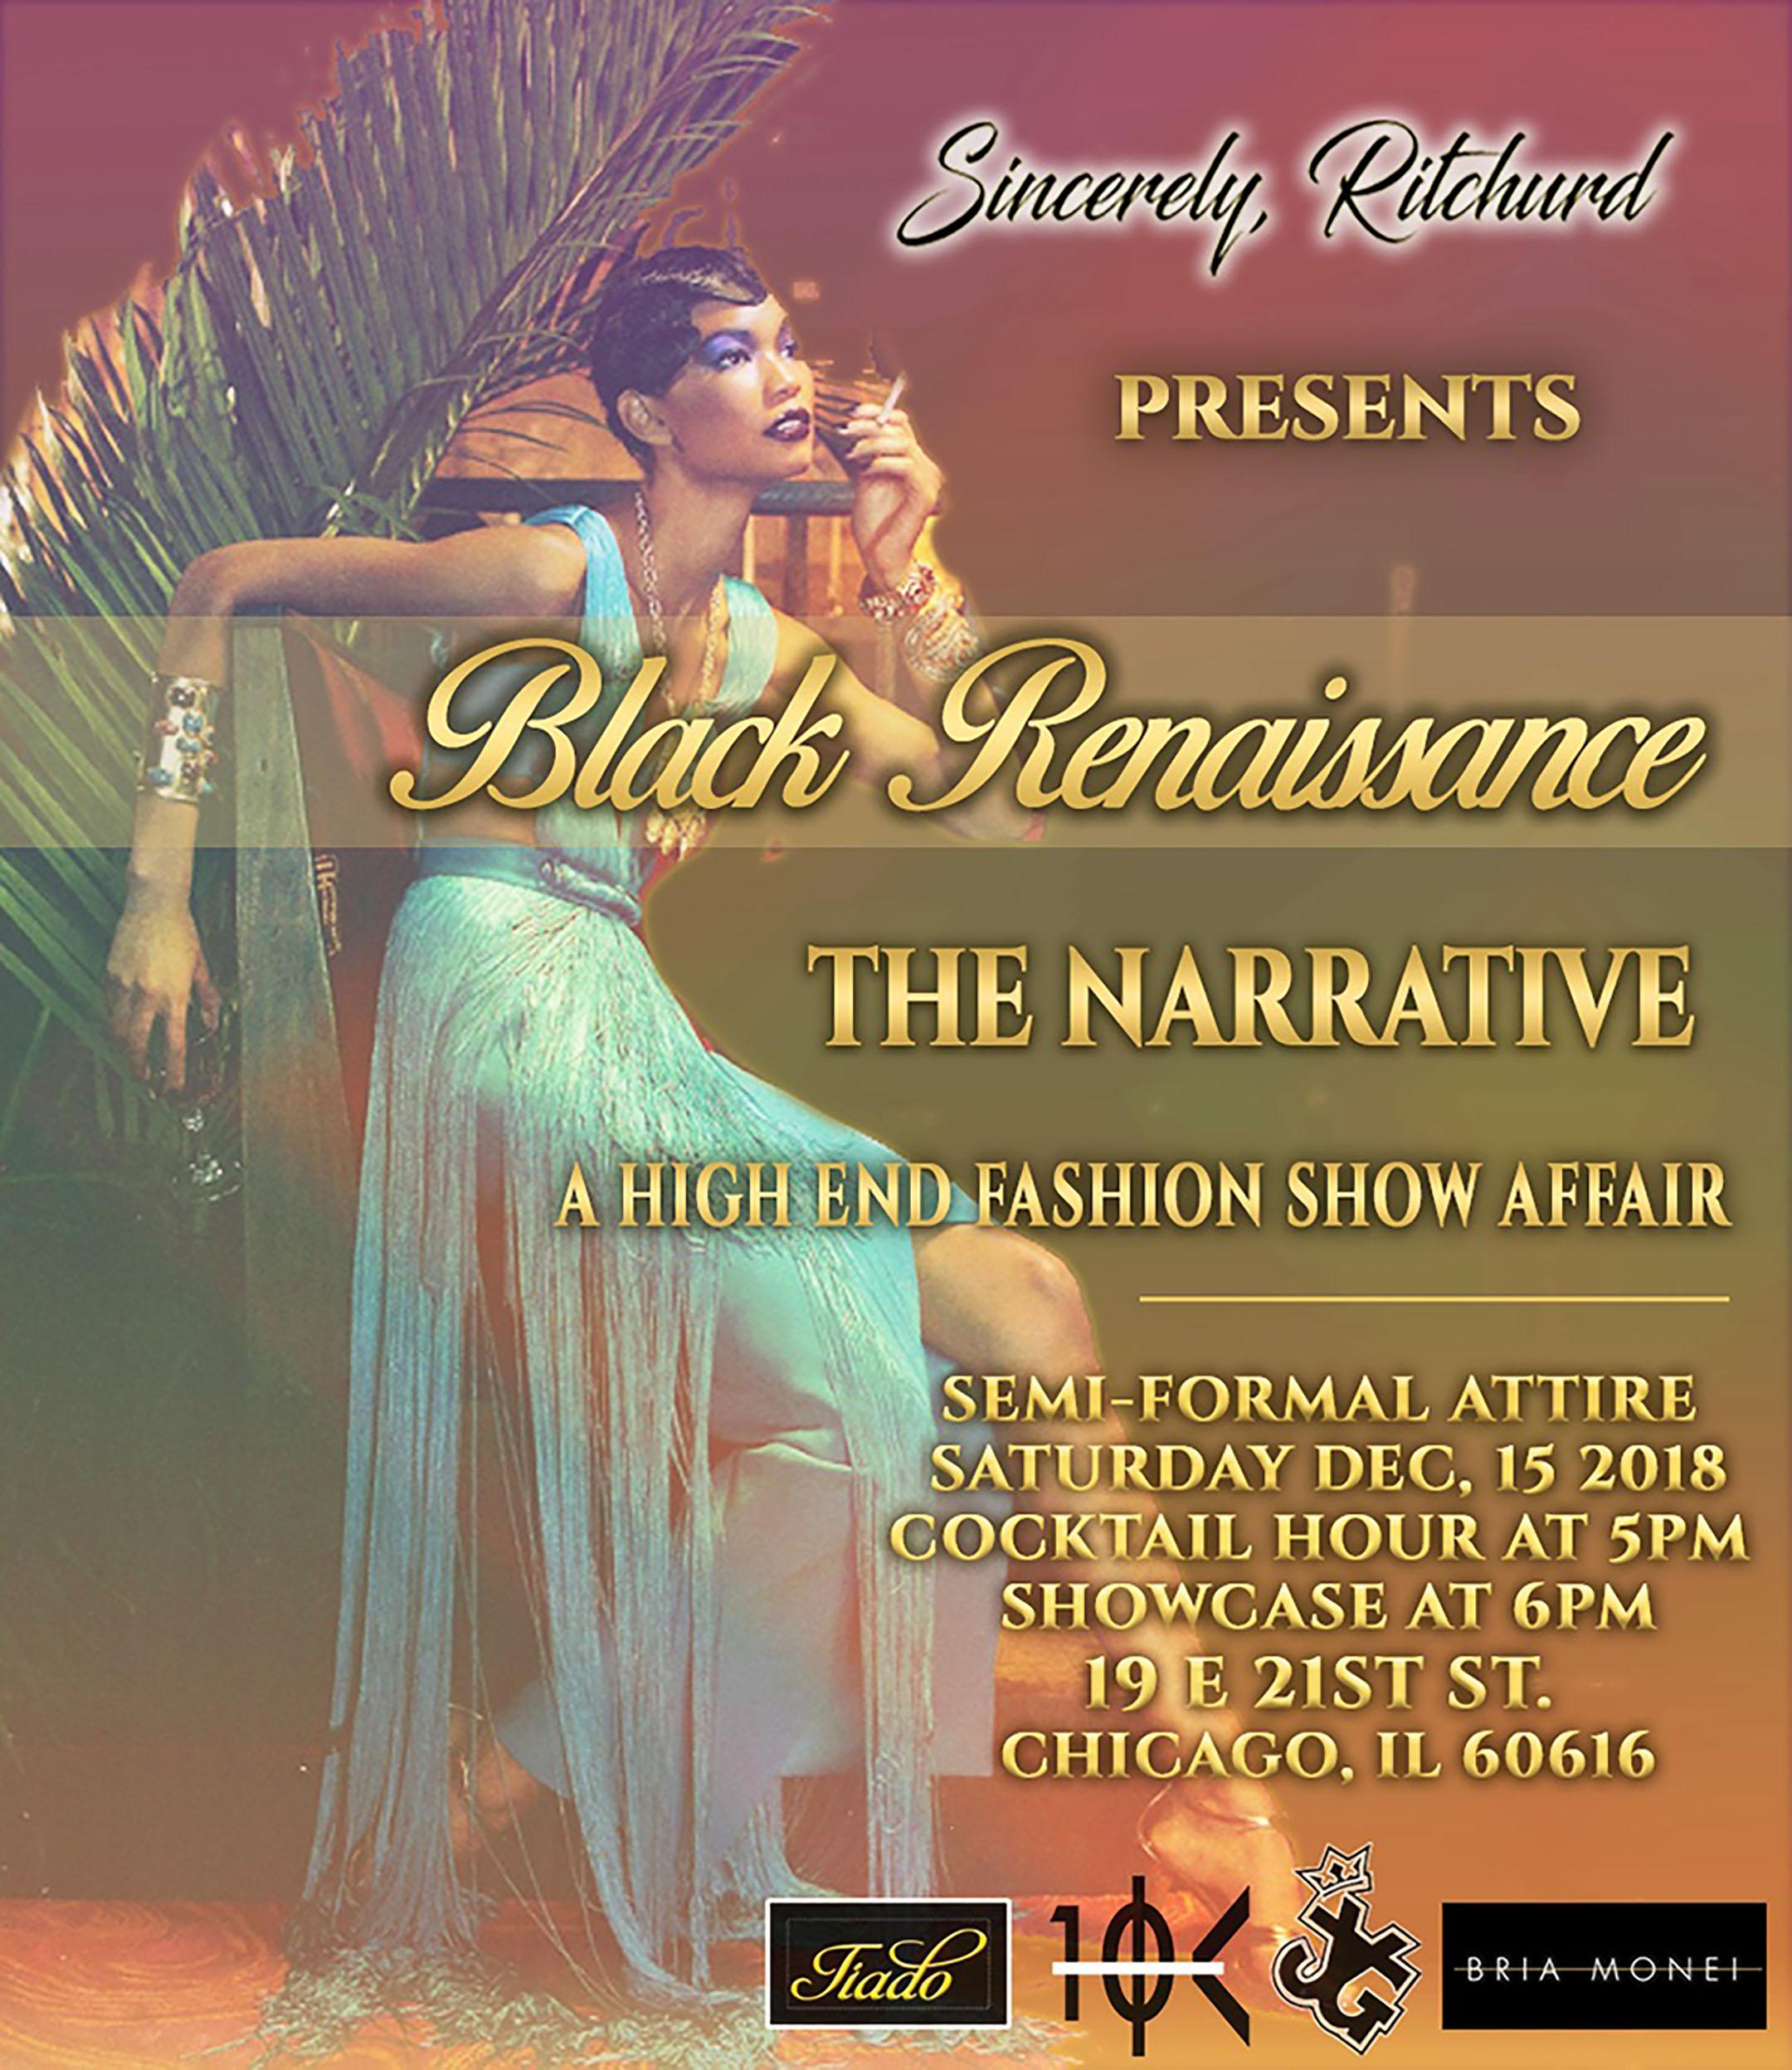 Sincerely Ritchurd Presents Black Renaissance: The Narrative